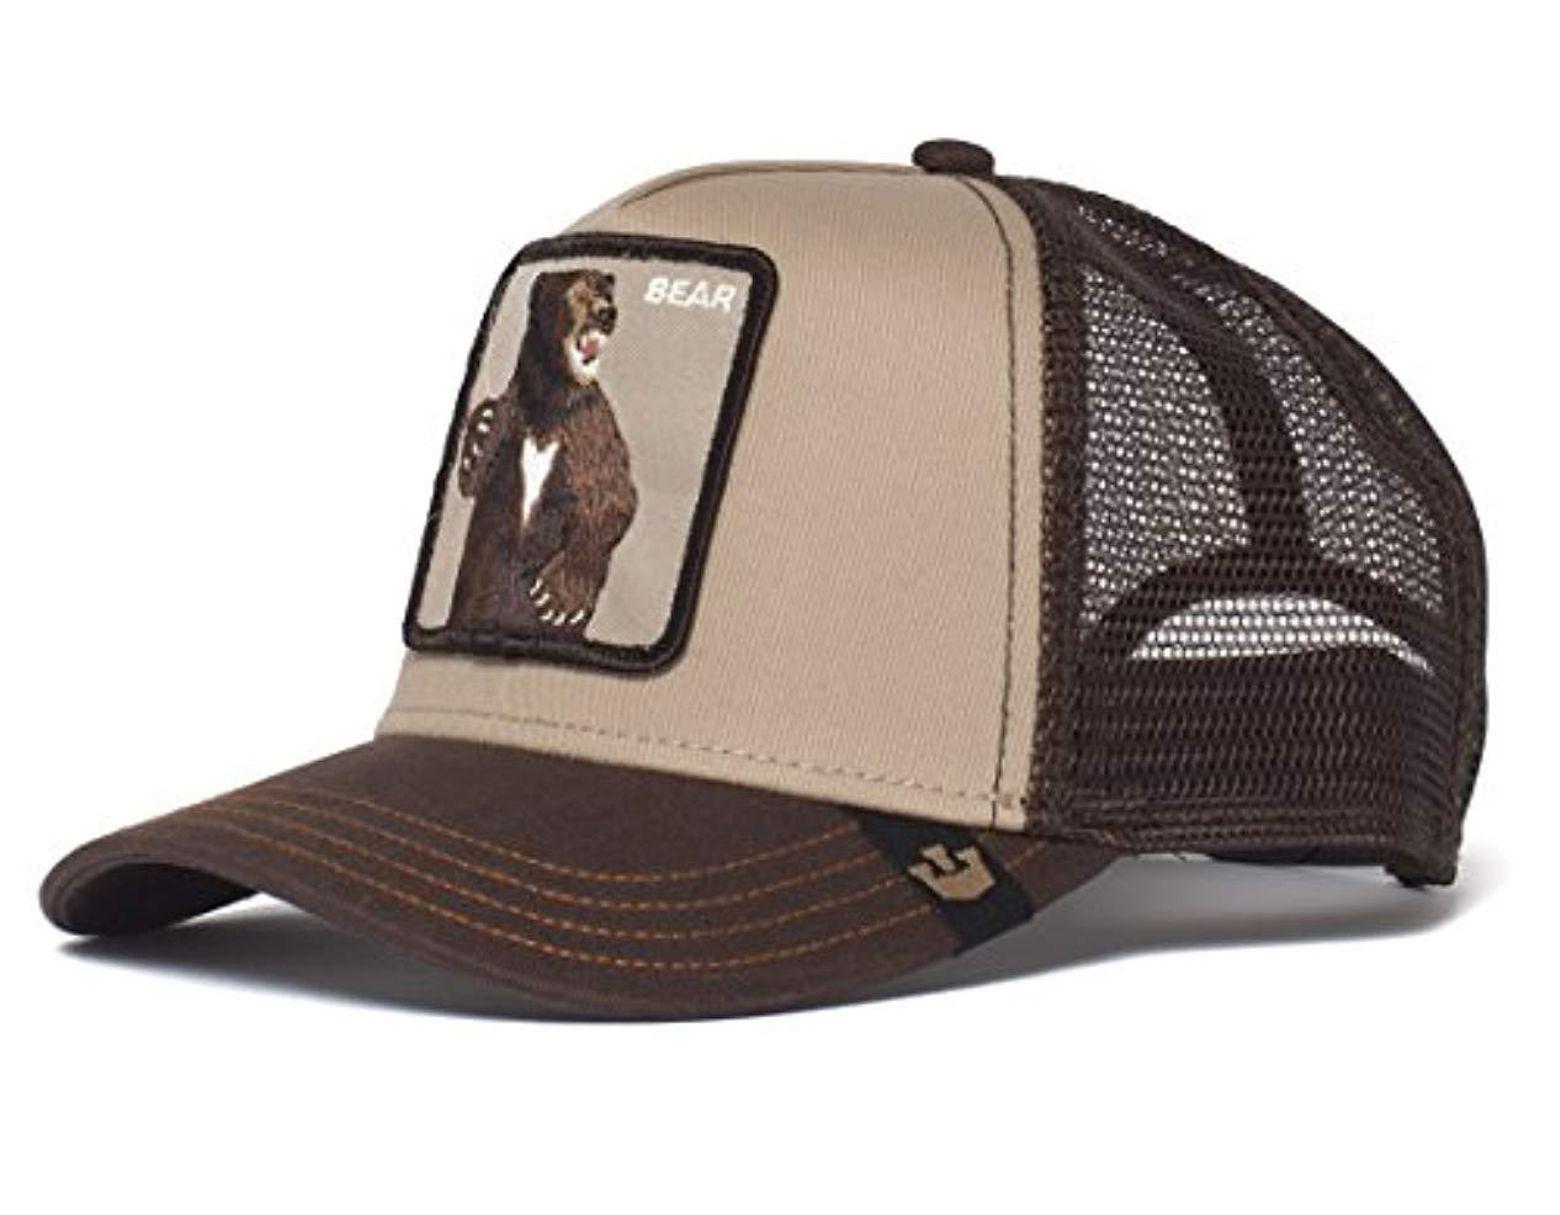 fe04f6122 Men's Brown Animal Farm Snap Back Trucker Hat